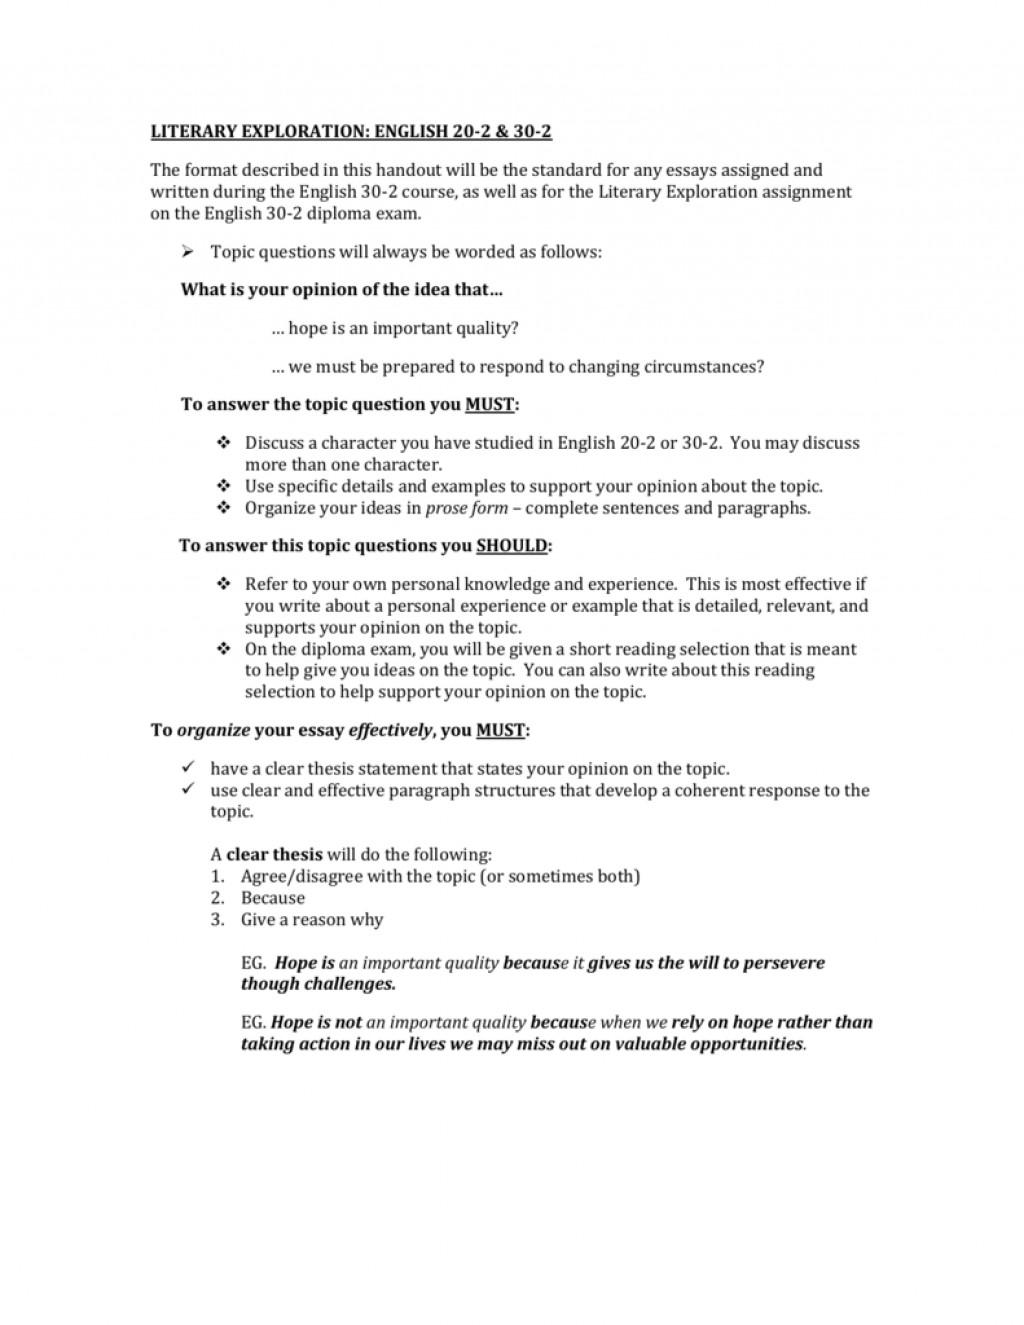 002 Essay Example English Examples Form 007481393 1 Wondrous 2 Large